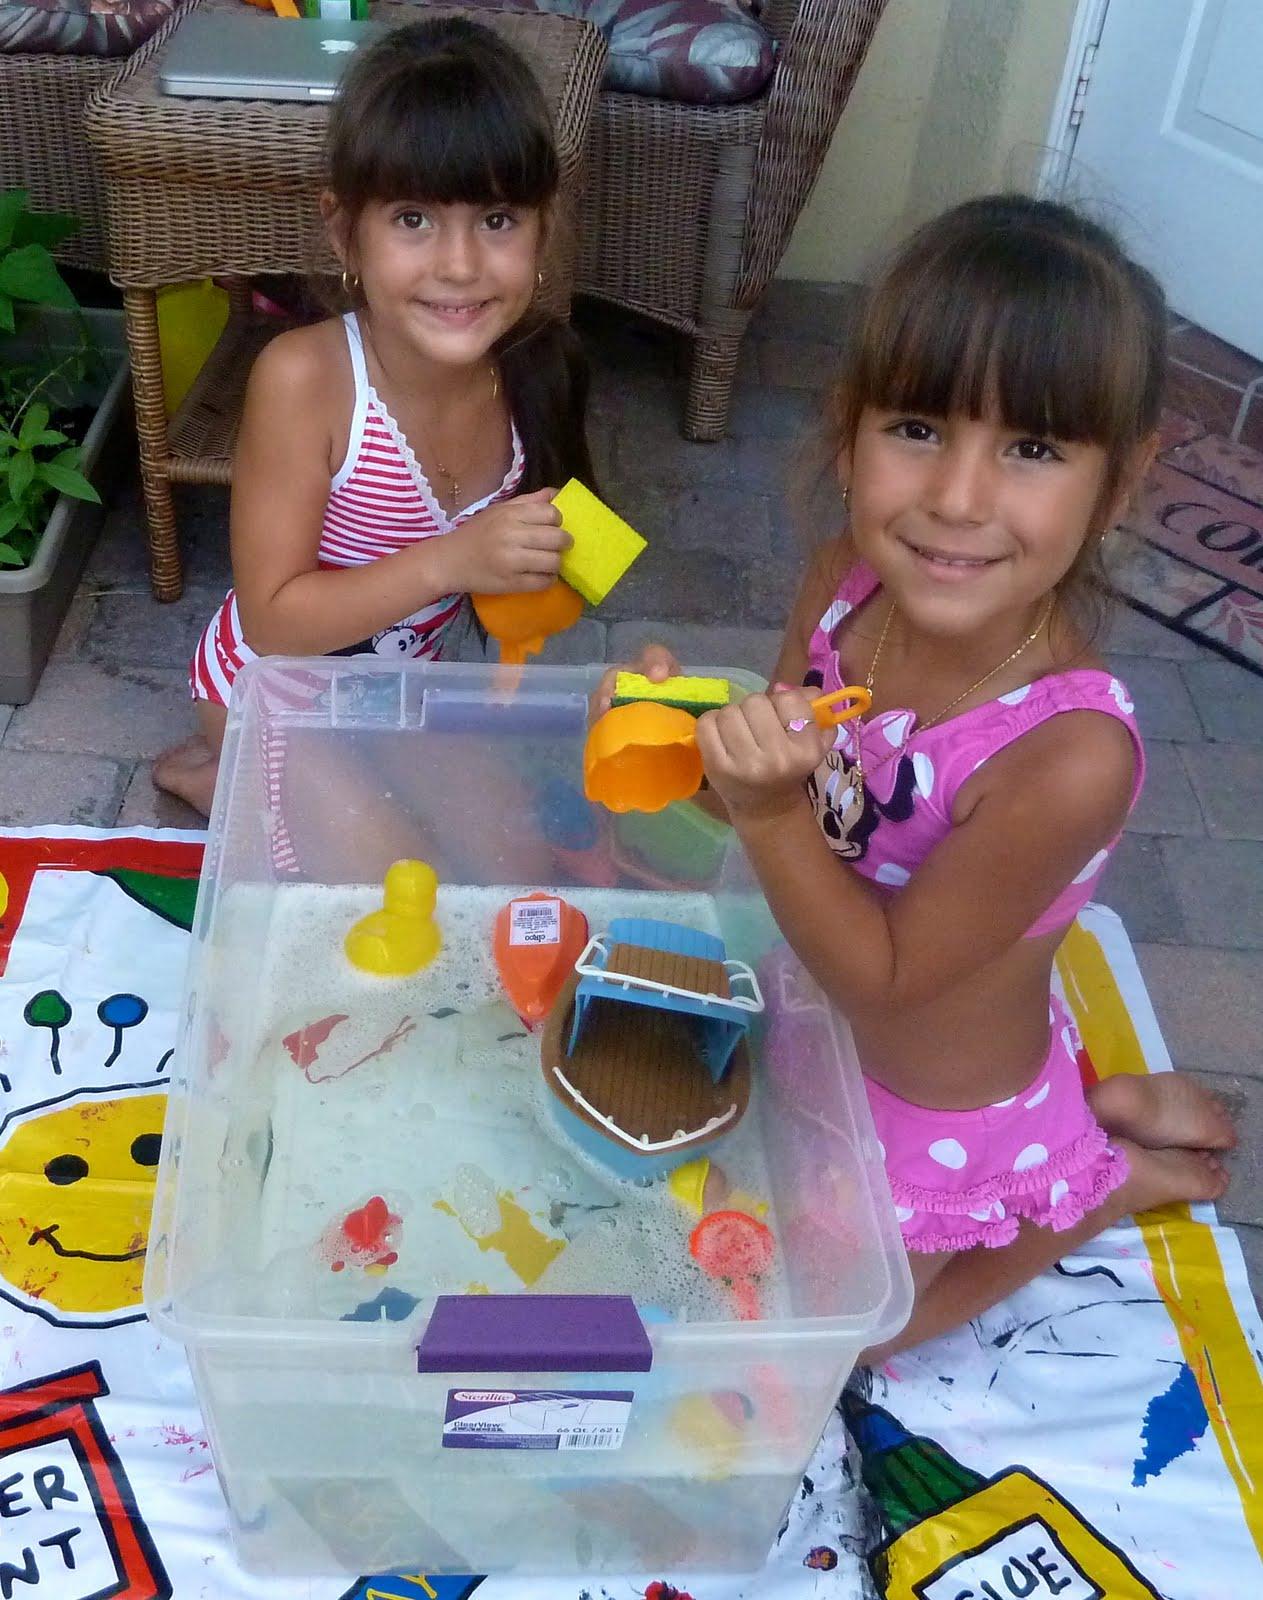 mom to 2 posh lil divas diy frugal water table fun